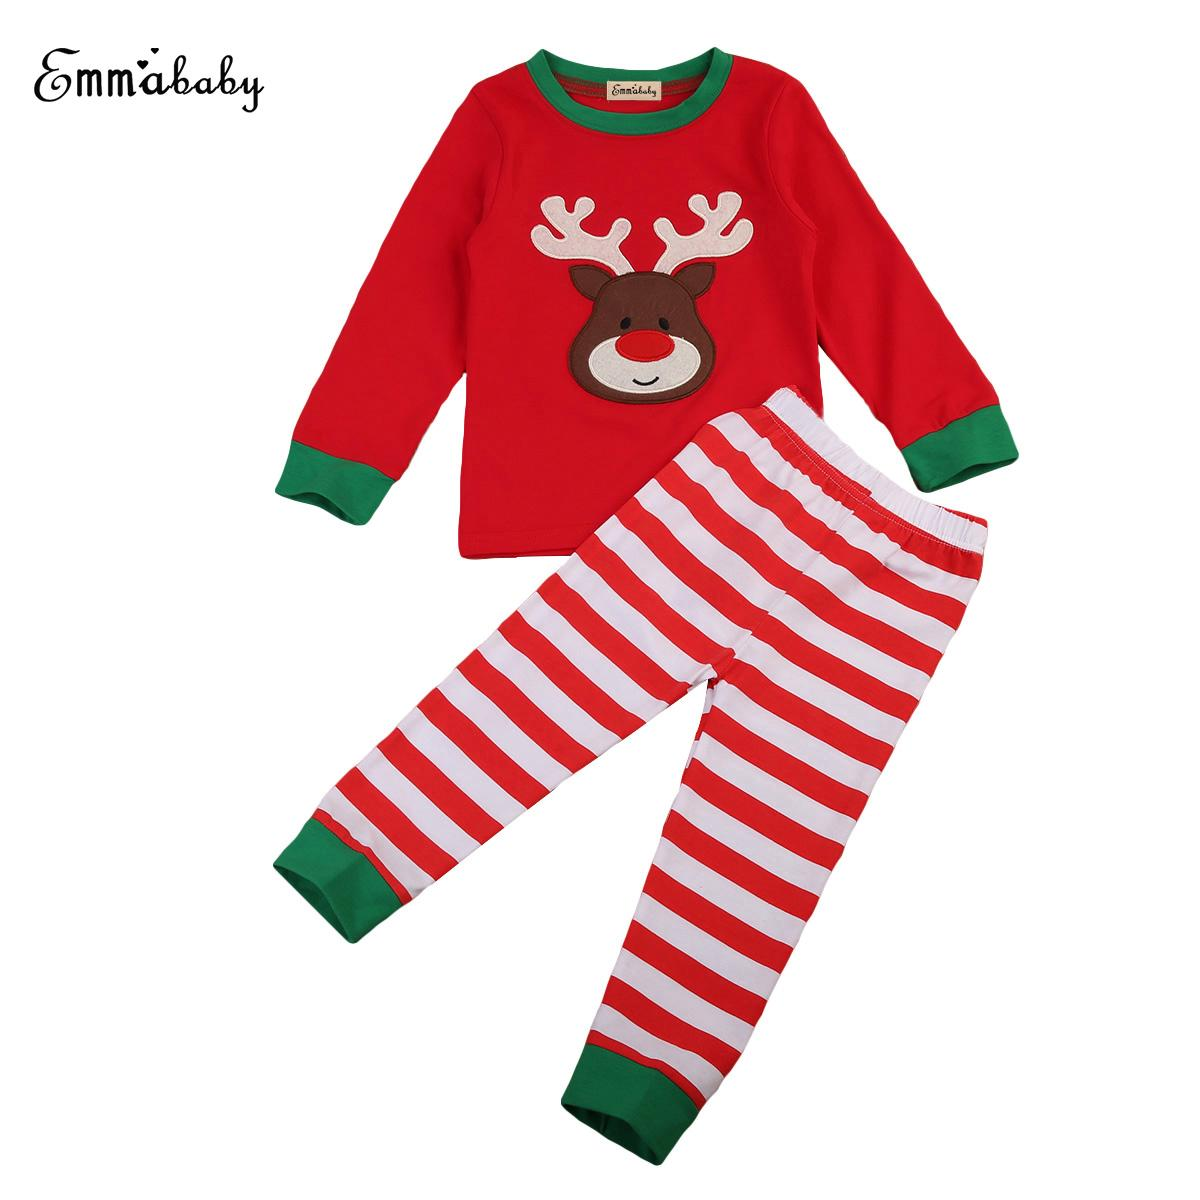 Kids Baby Boys Girls Christmas Pajamas Set Long Sleeve Santa Claus T-Shirt Top Striped Pants Outfit